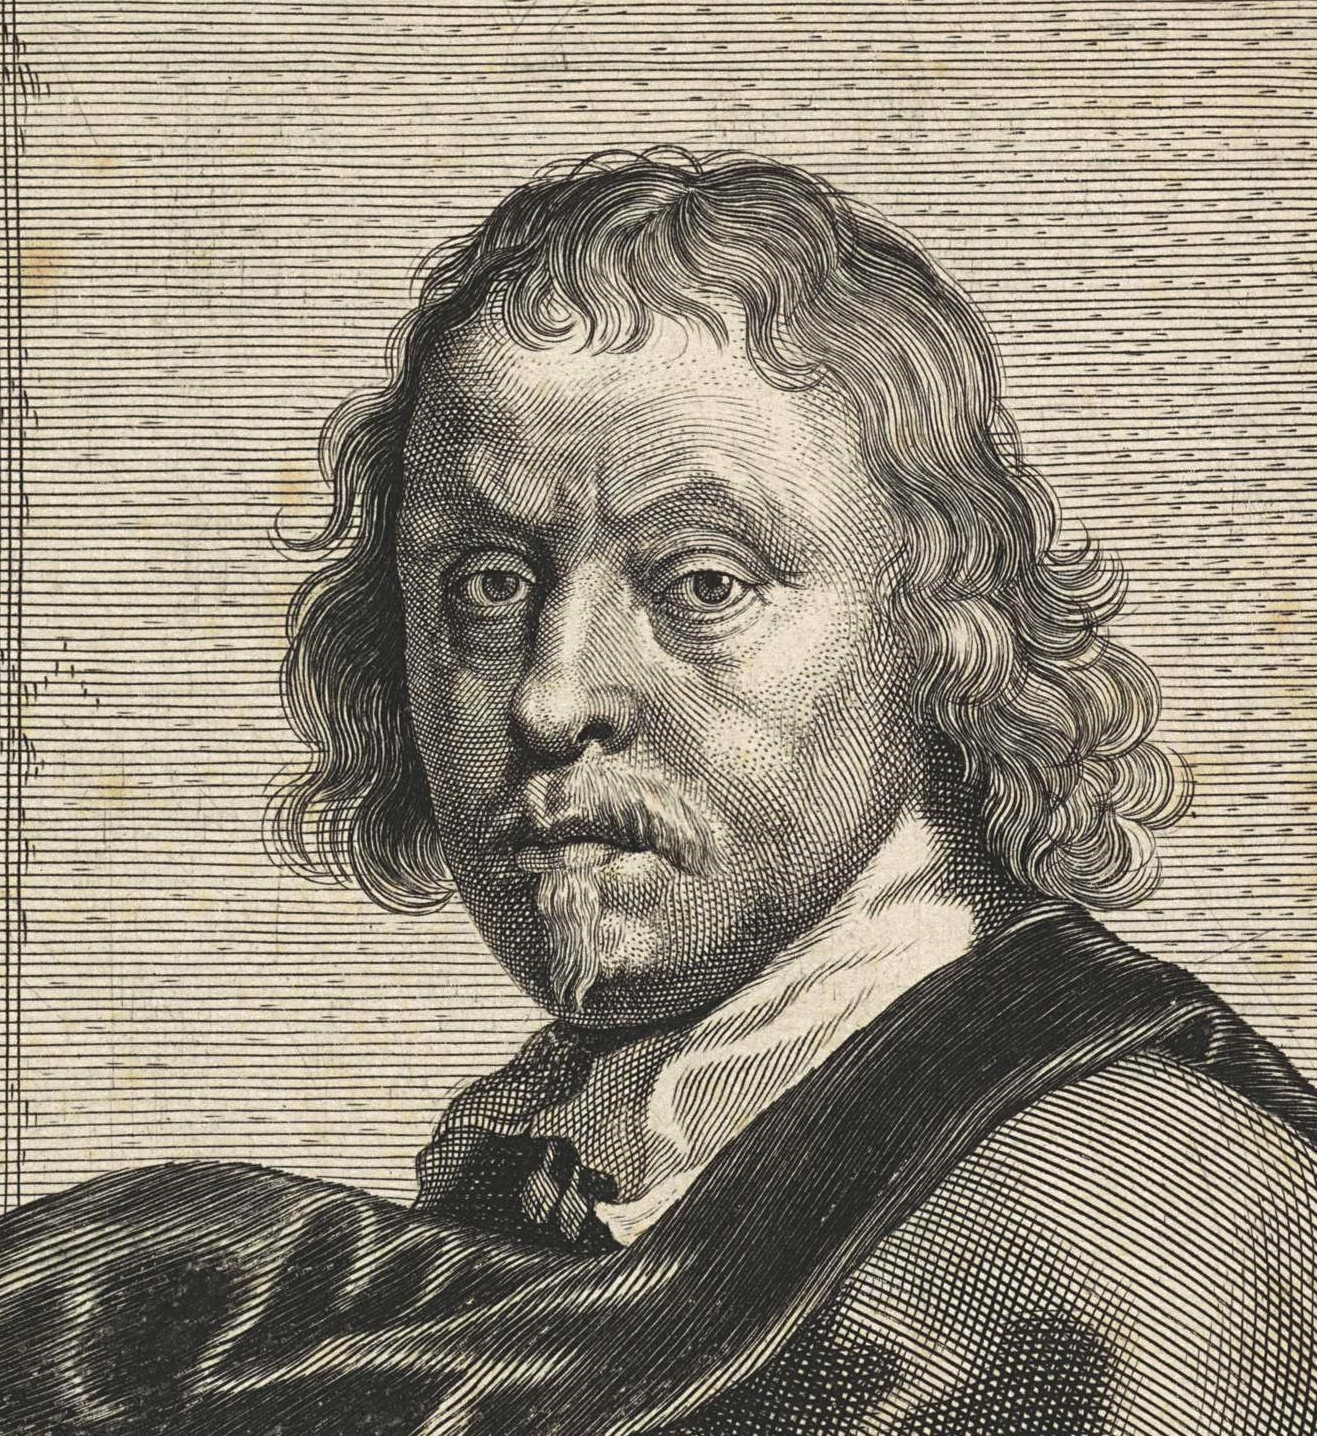 Cornelis Van Poelenburch